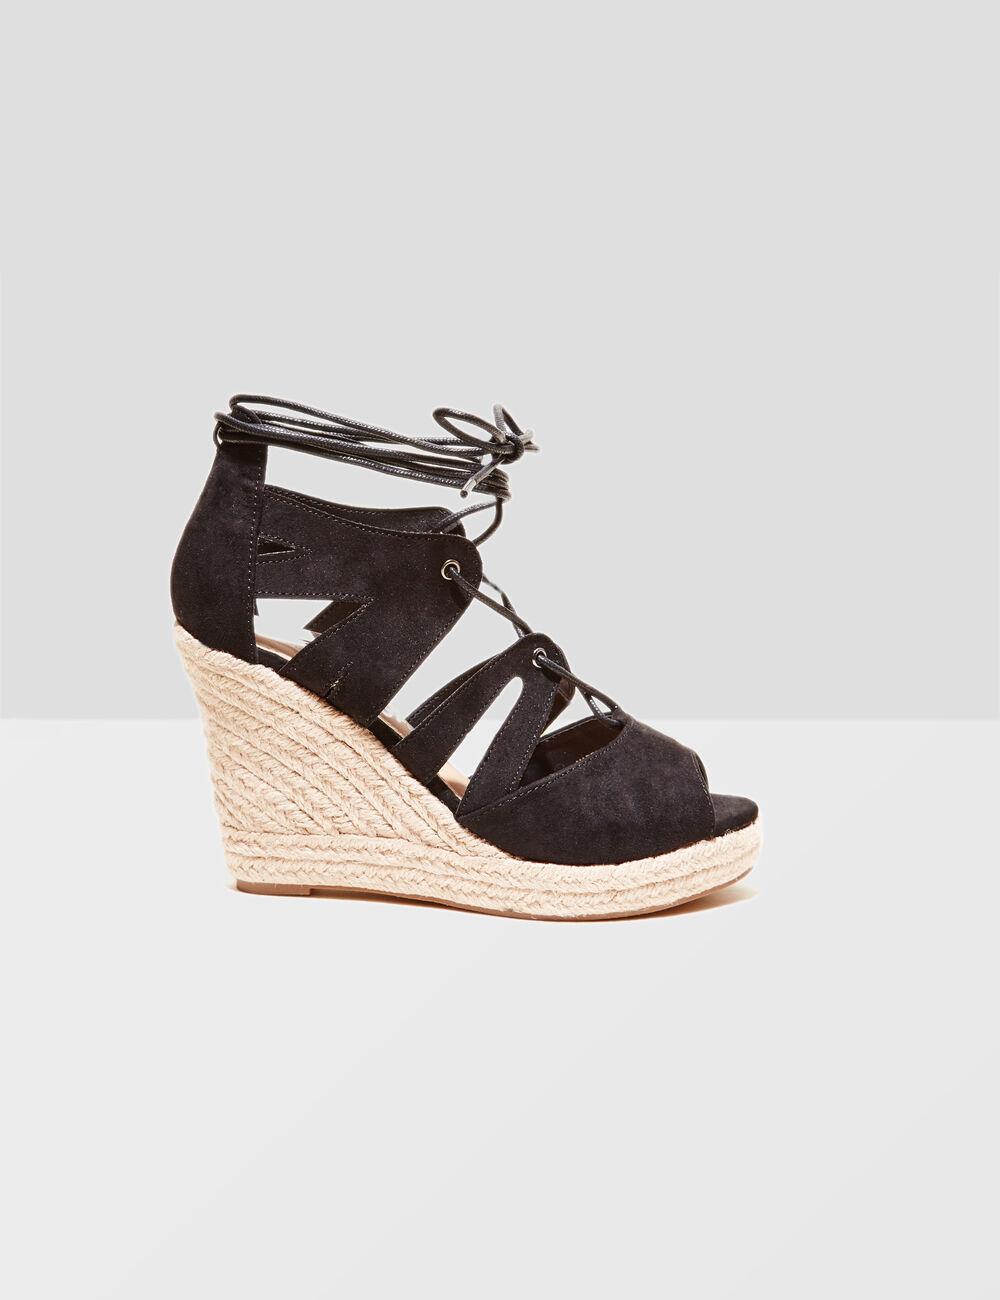 Chaussures pour pieds larges Gabor Casual femme nY7aqu9